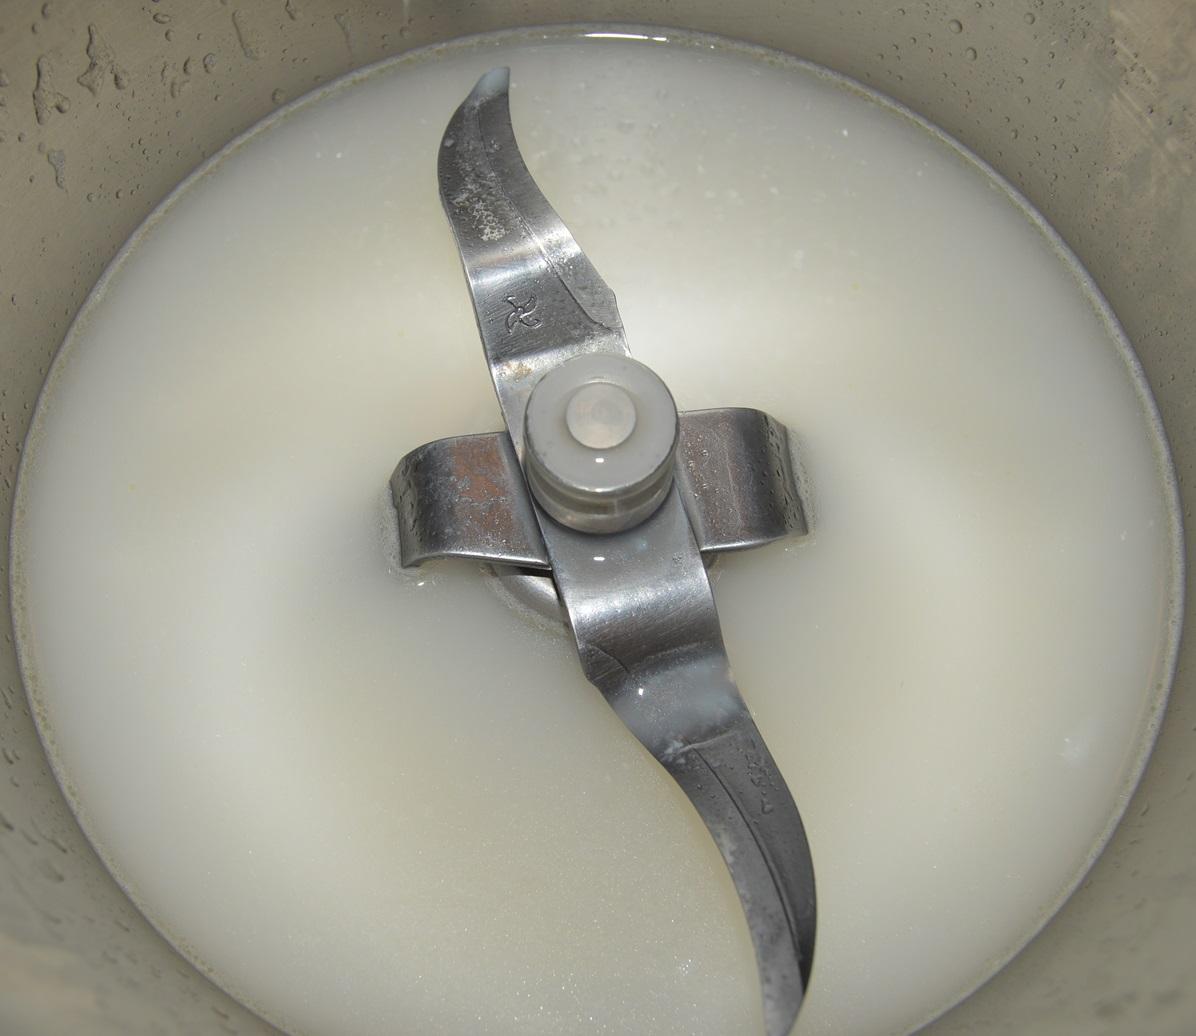 Levadura disuelta en agua. Aroma de chocolate